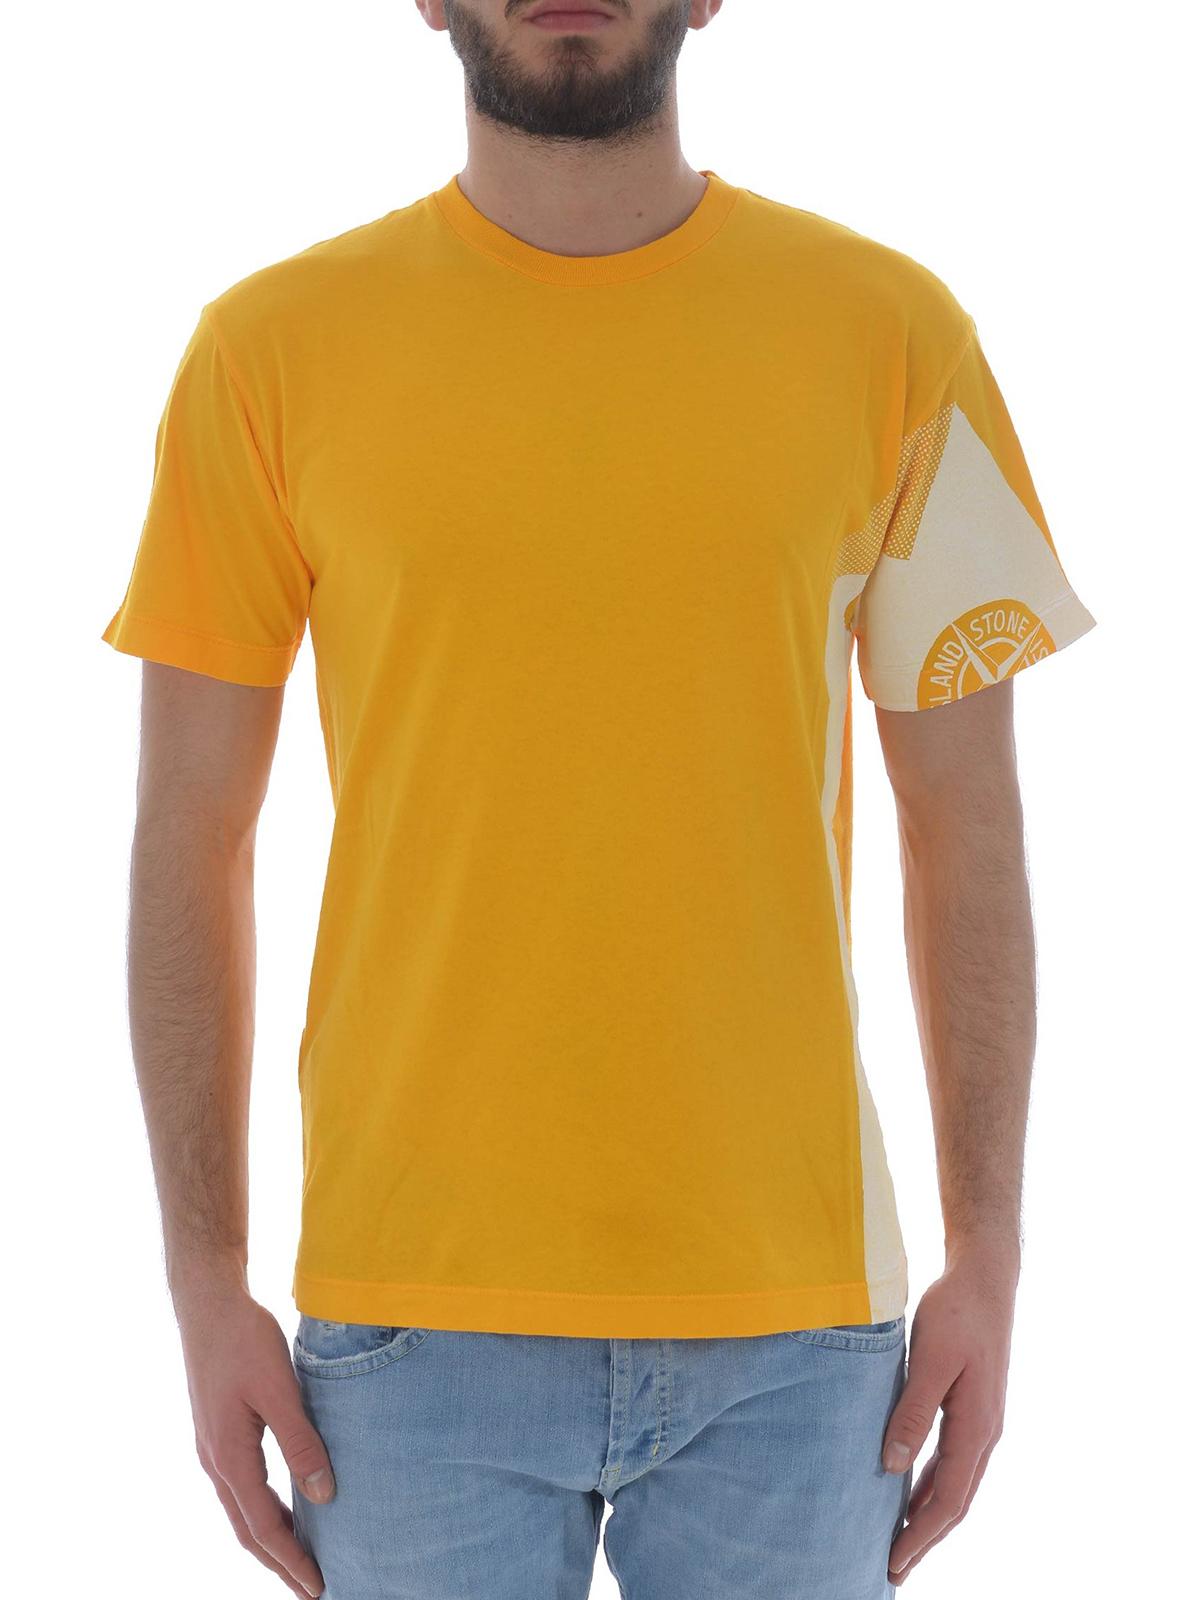 86f084fef Stone Island - Graphic Five Folded yellow Tee - t-shirts - 2NS85V0030